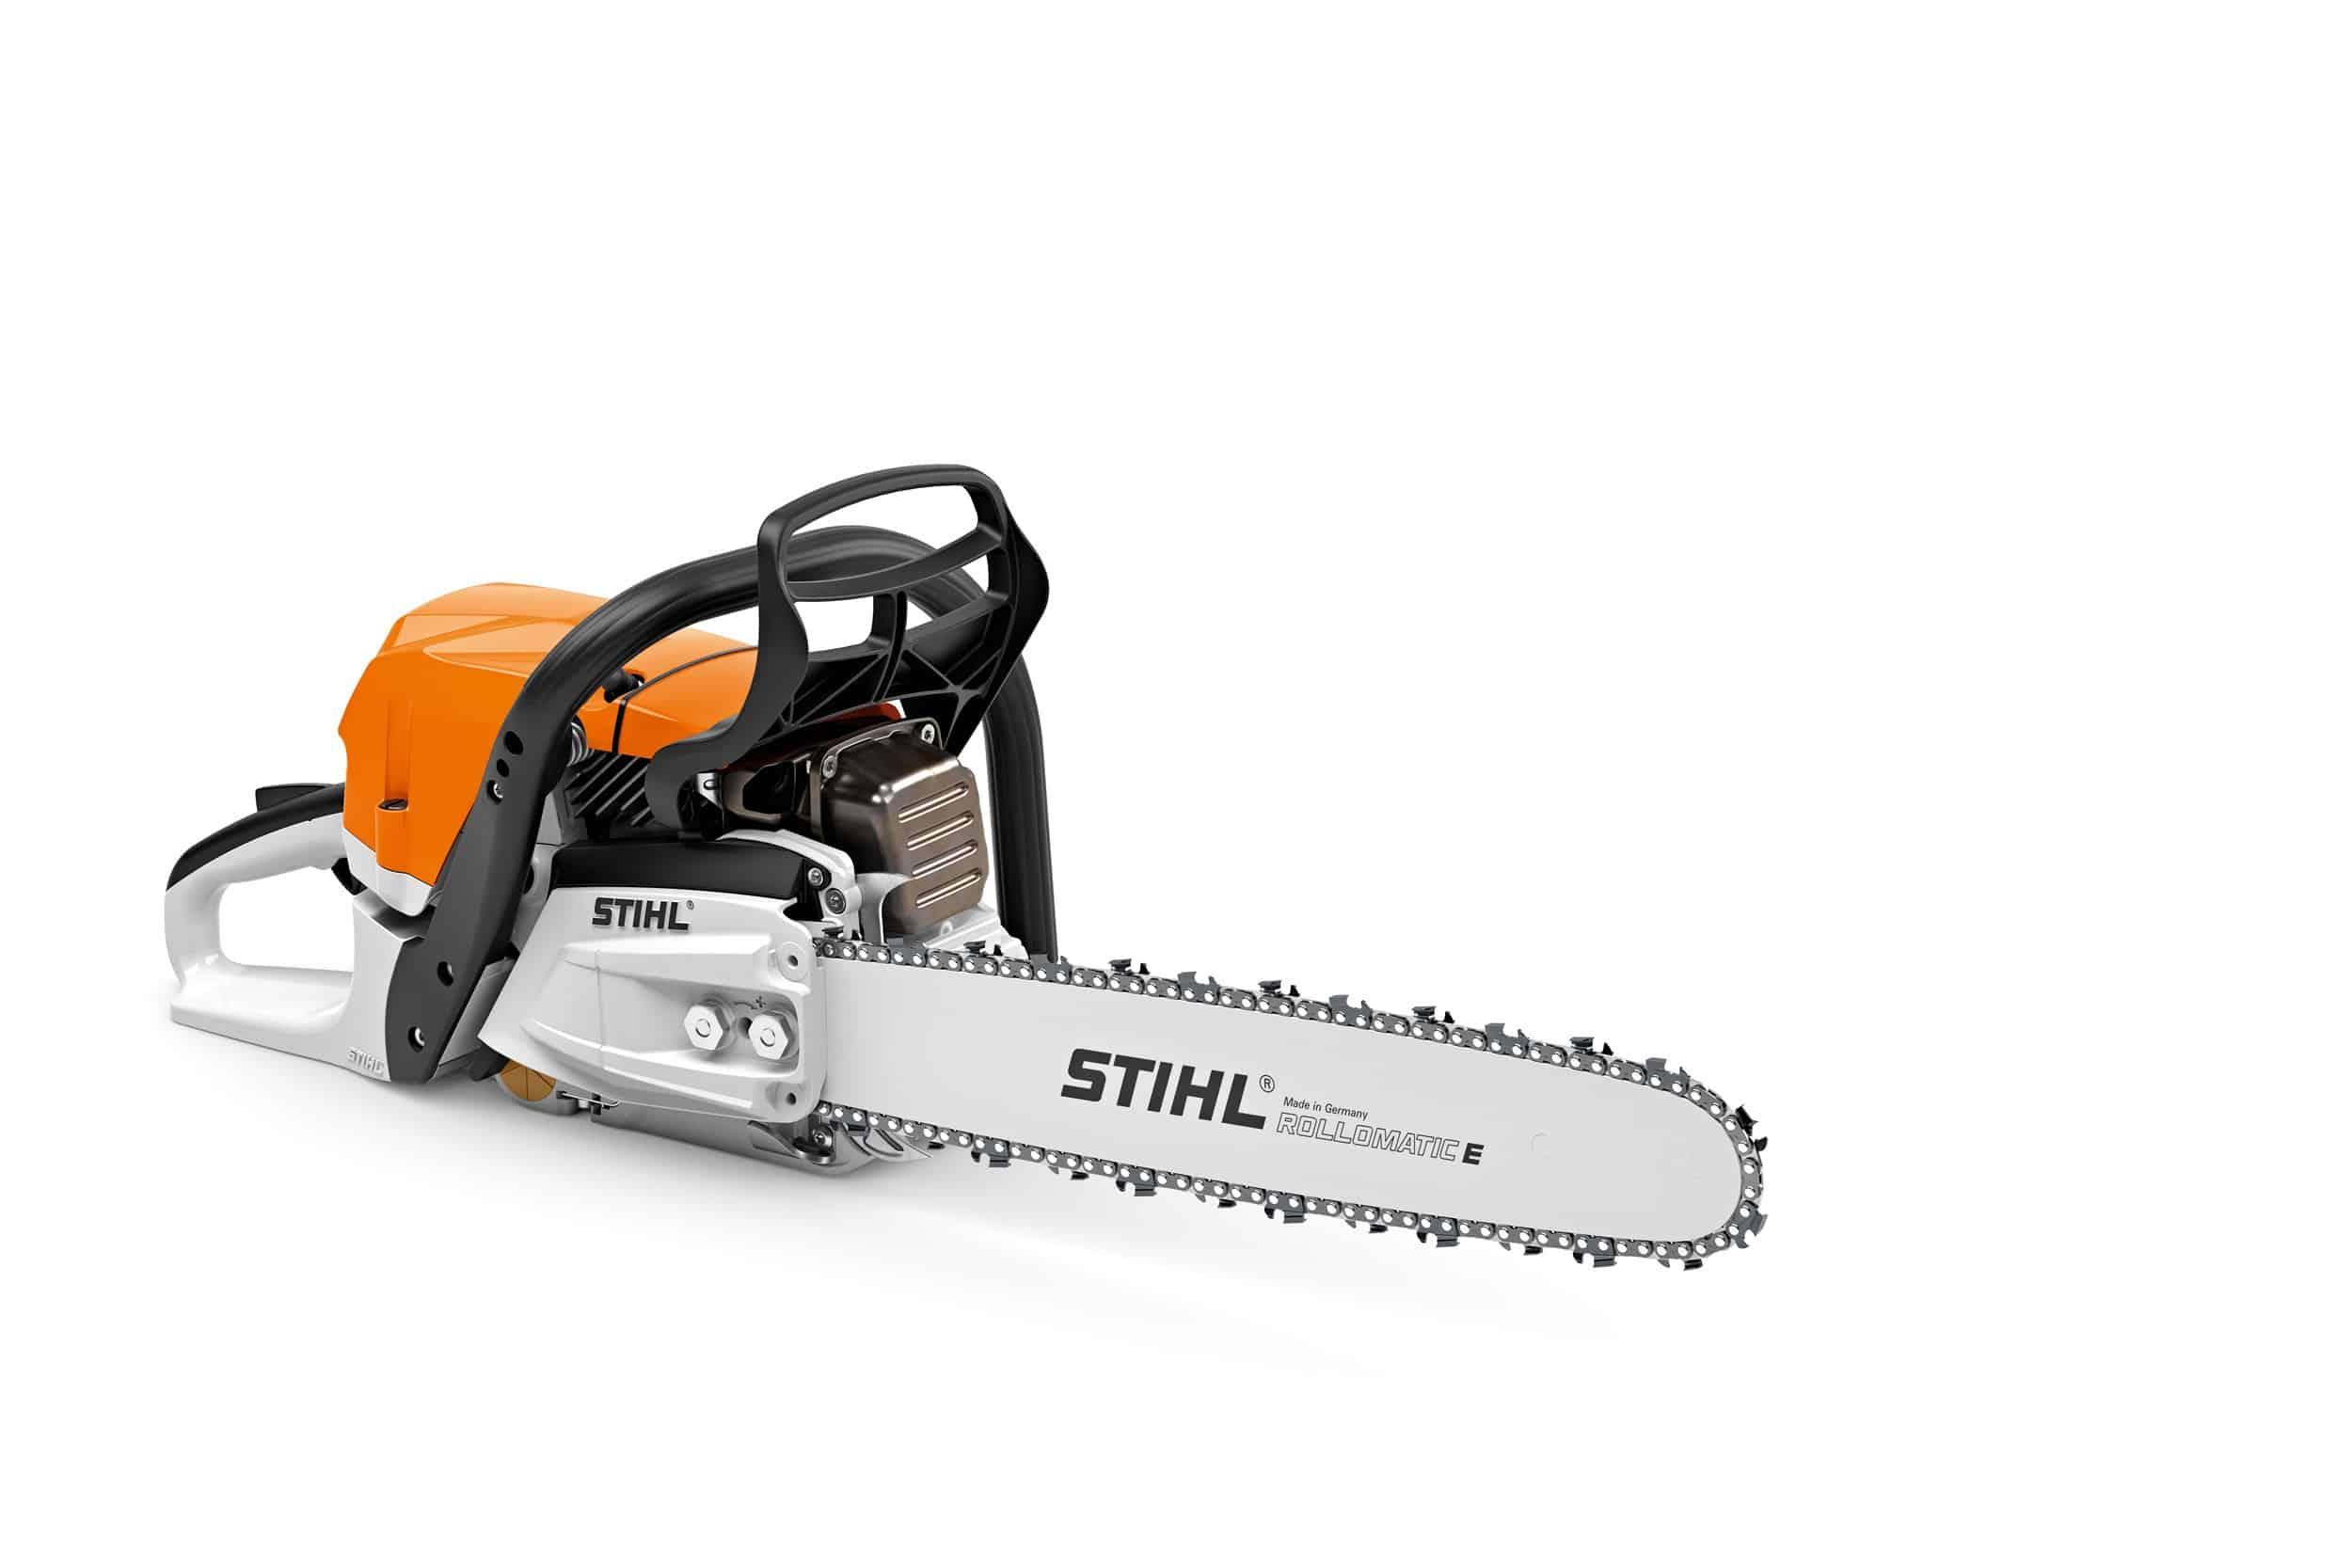 Stihl MS400 C-M Powerful Professional Chainsaw 16″/20″